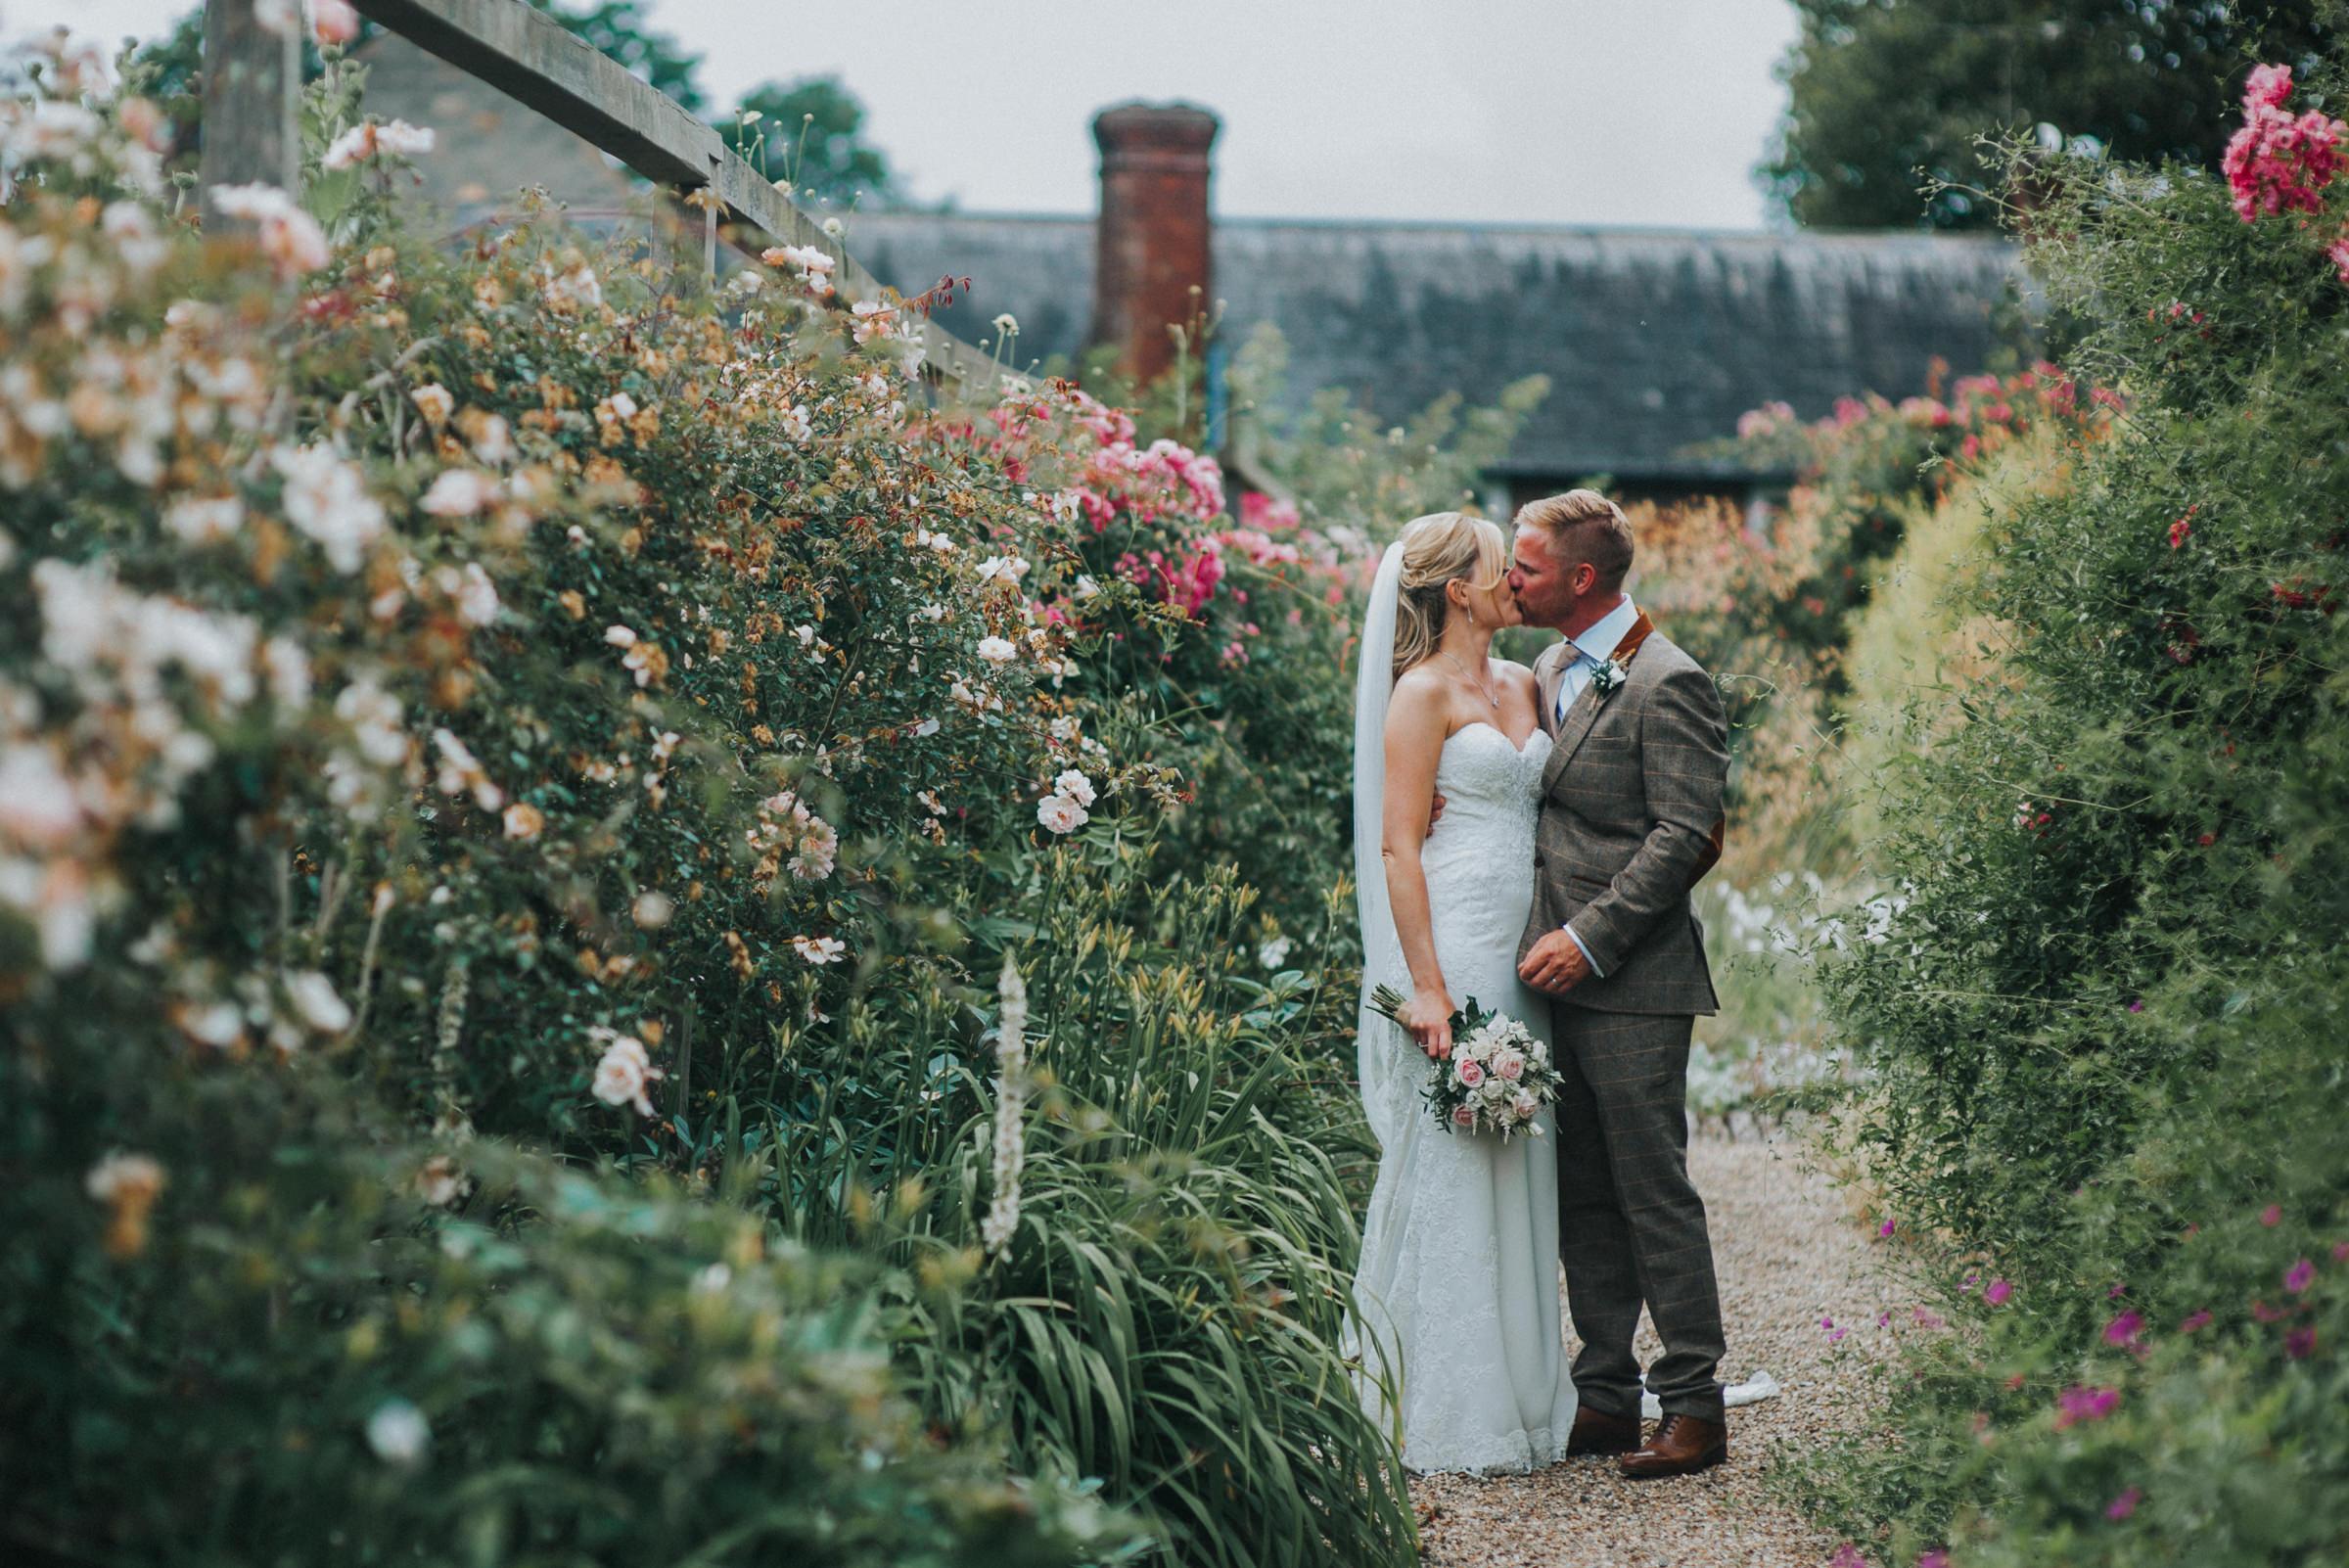 Falconhurst Kent Wedding Venue Sussex Weddings-6682.JPG